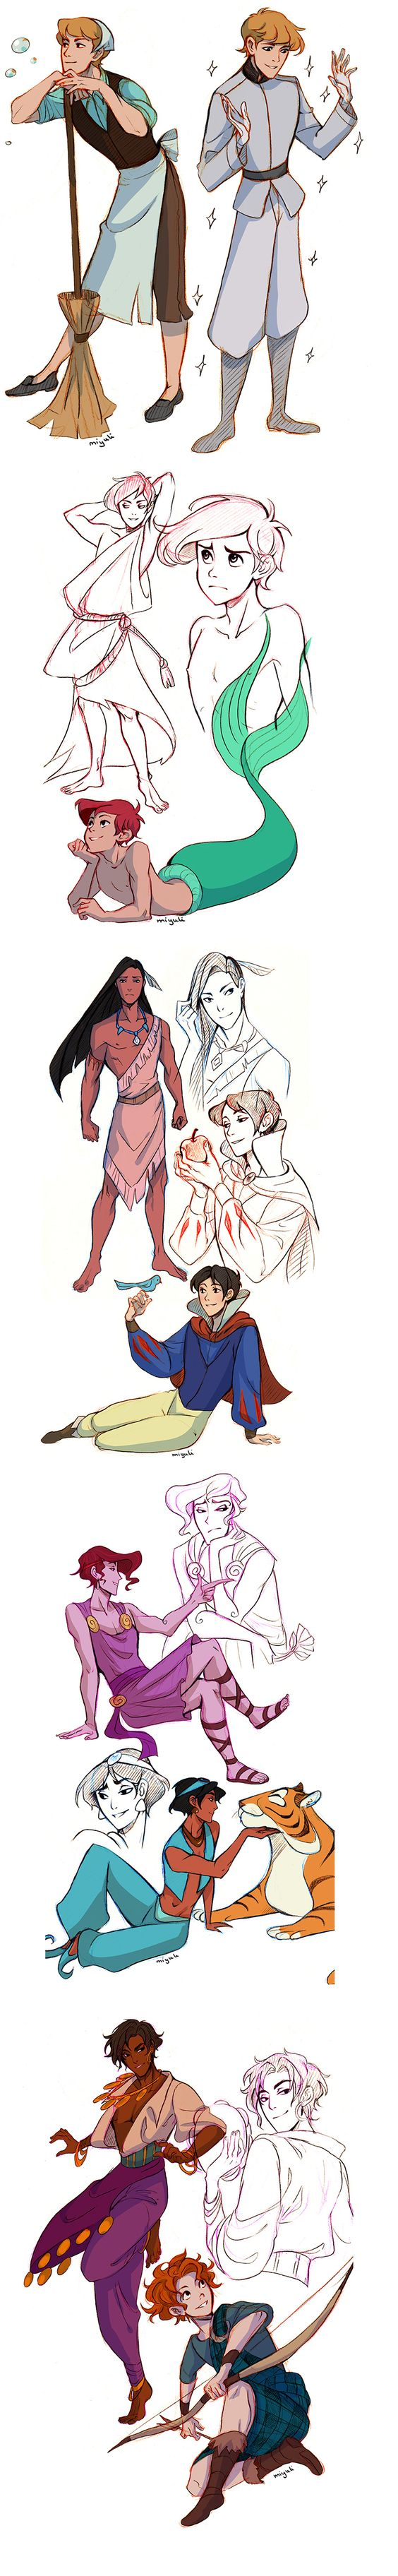 genderbent disney princesses. I really like Meg and cinderella